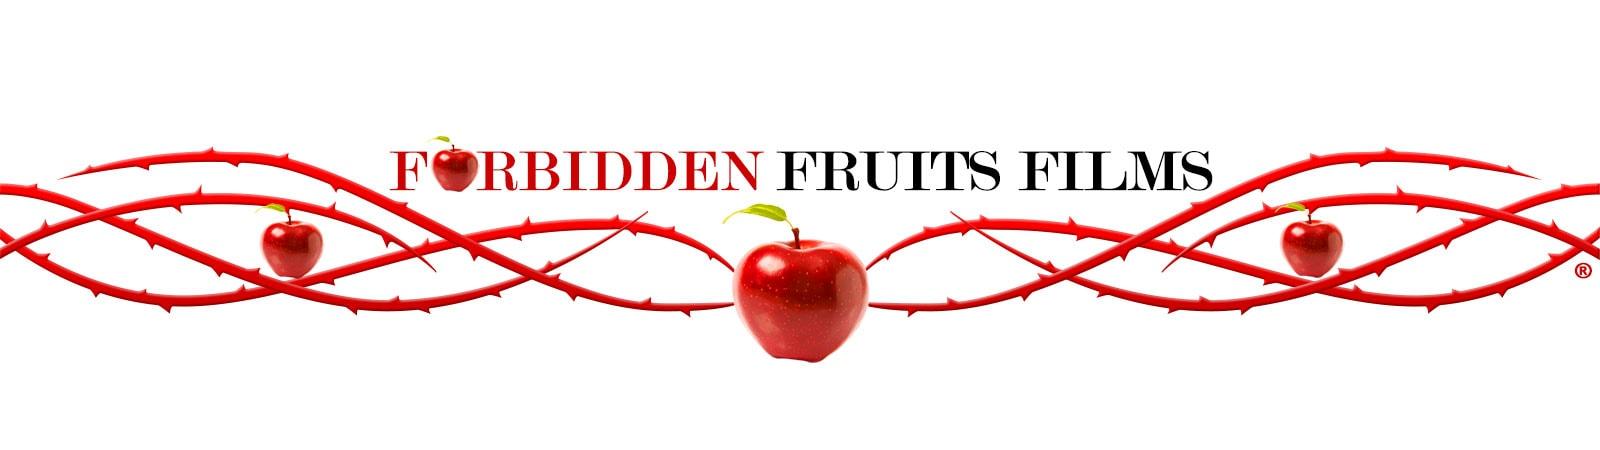 Forbidden Fruits Films Logo